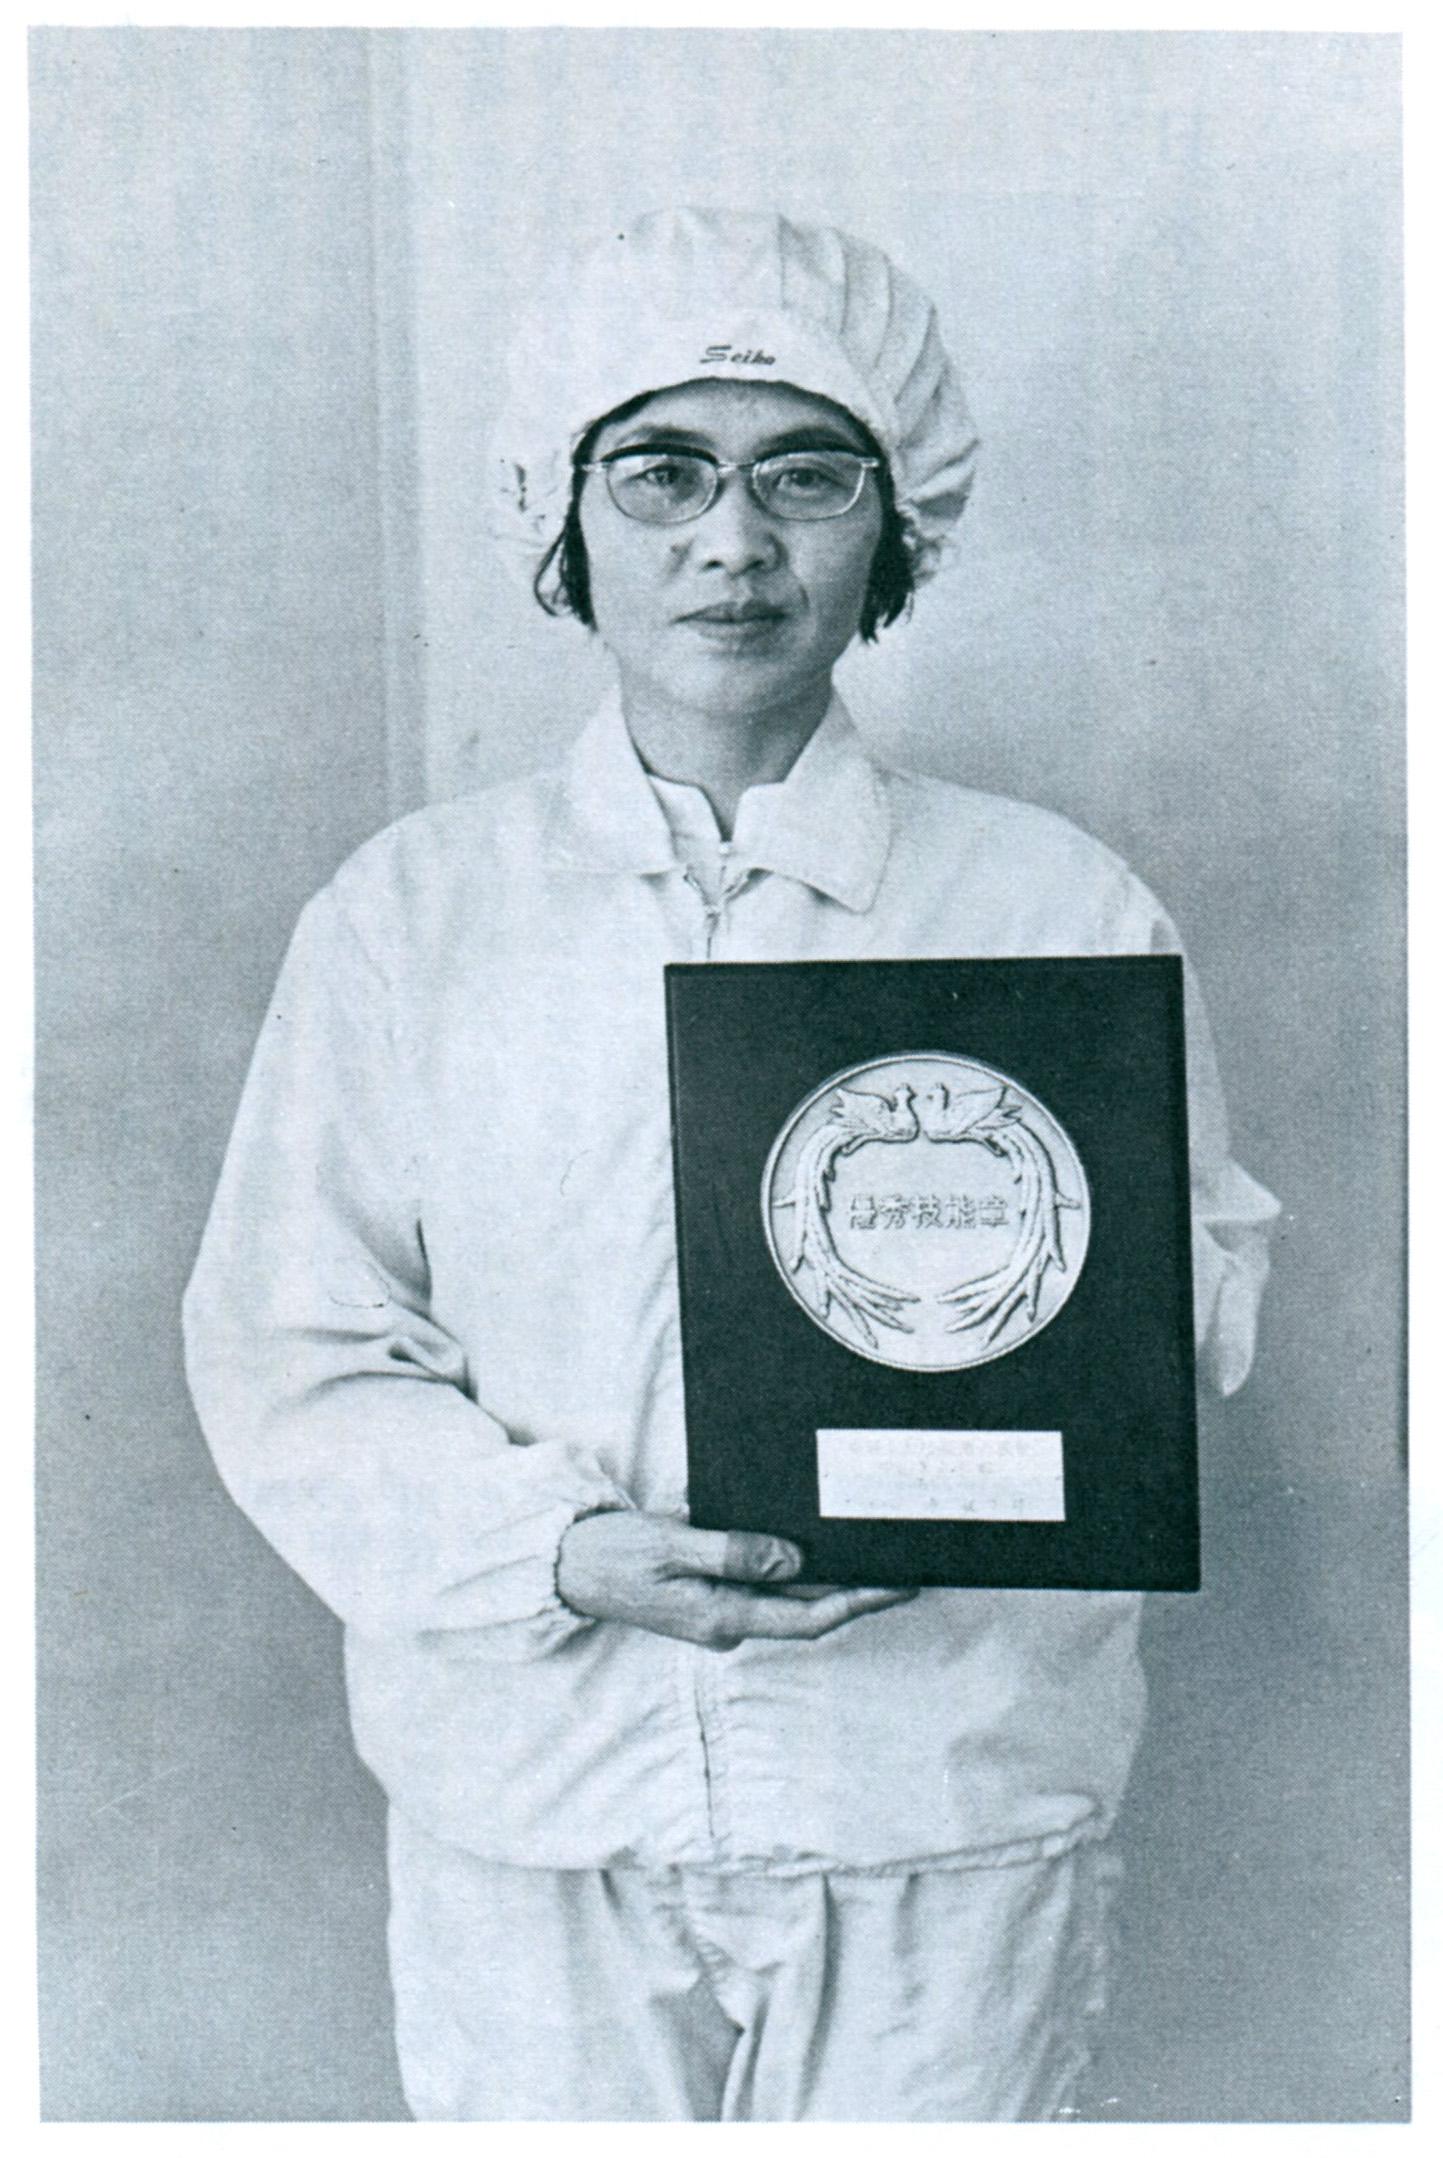 Great Craftsperson Award (1971)